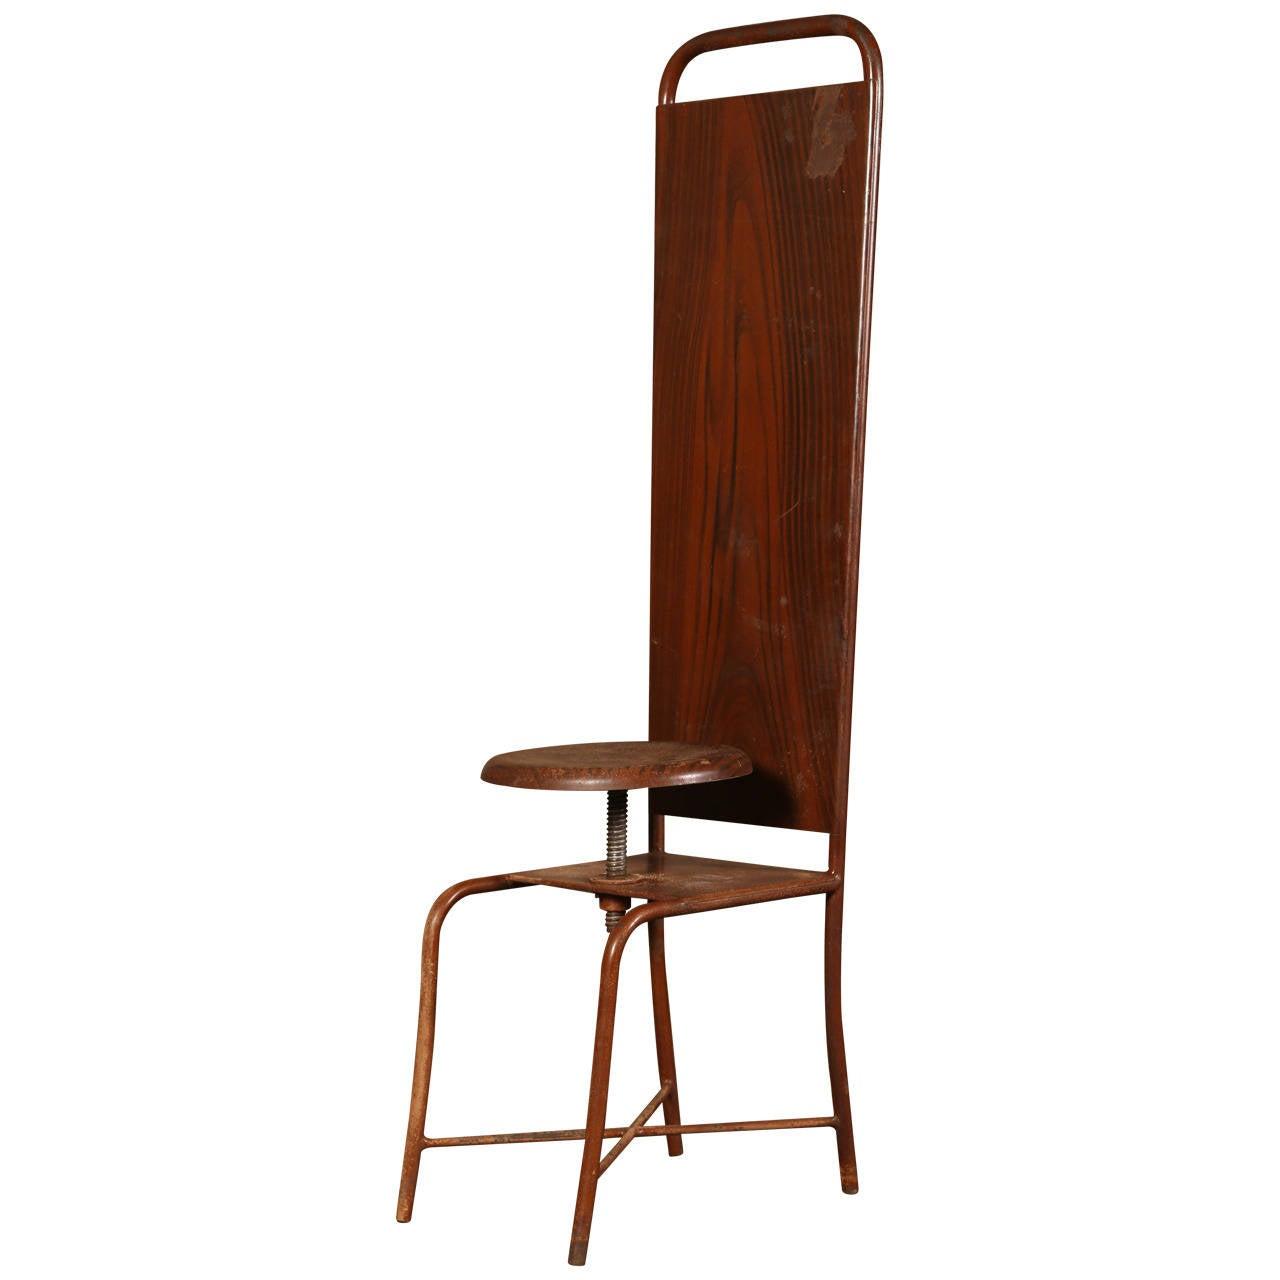 american leather swing chair baby sale original vintage adjustable medical stool or at 1stdibs